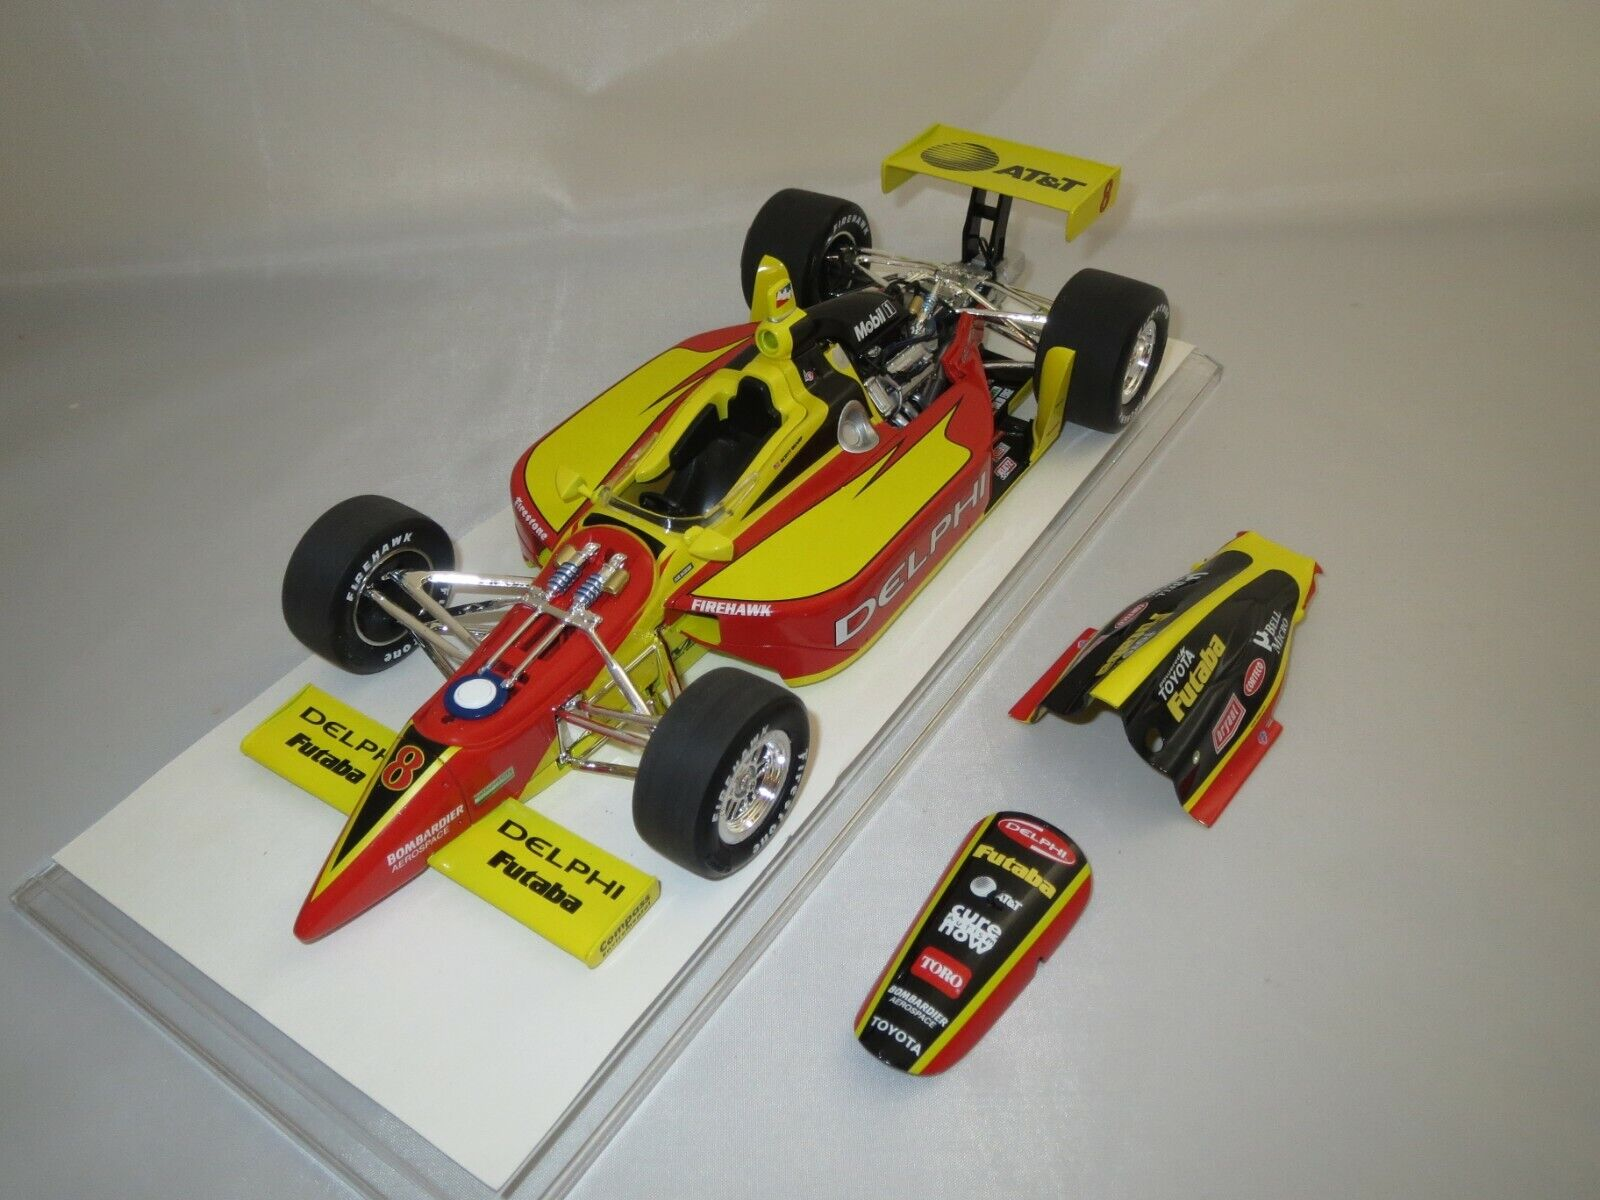 Action Performance  Indy Racing Car  Scott Sharp  8  Delphi  2003  Dallara (S7)  |  Neuer Markt